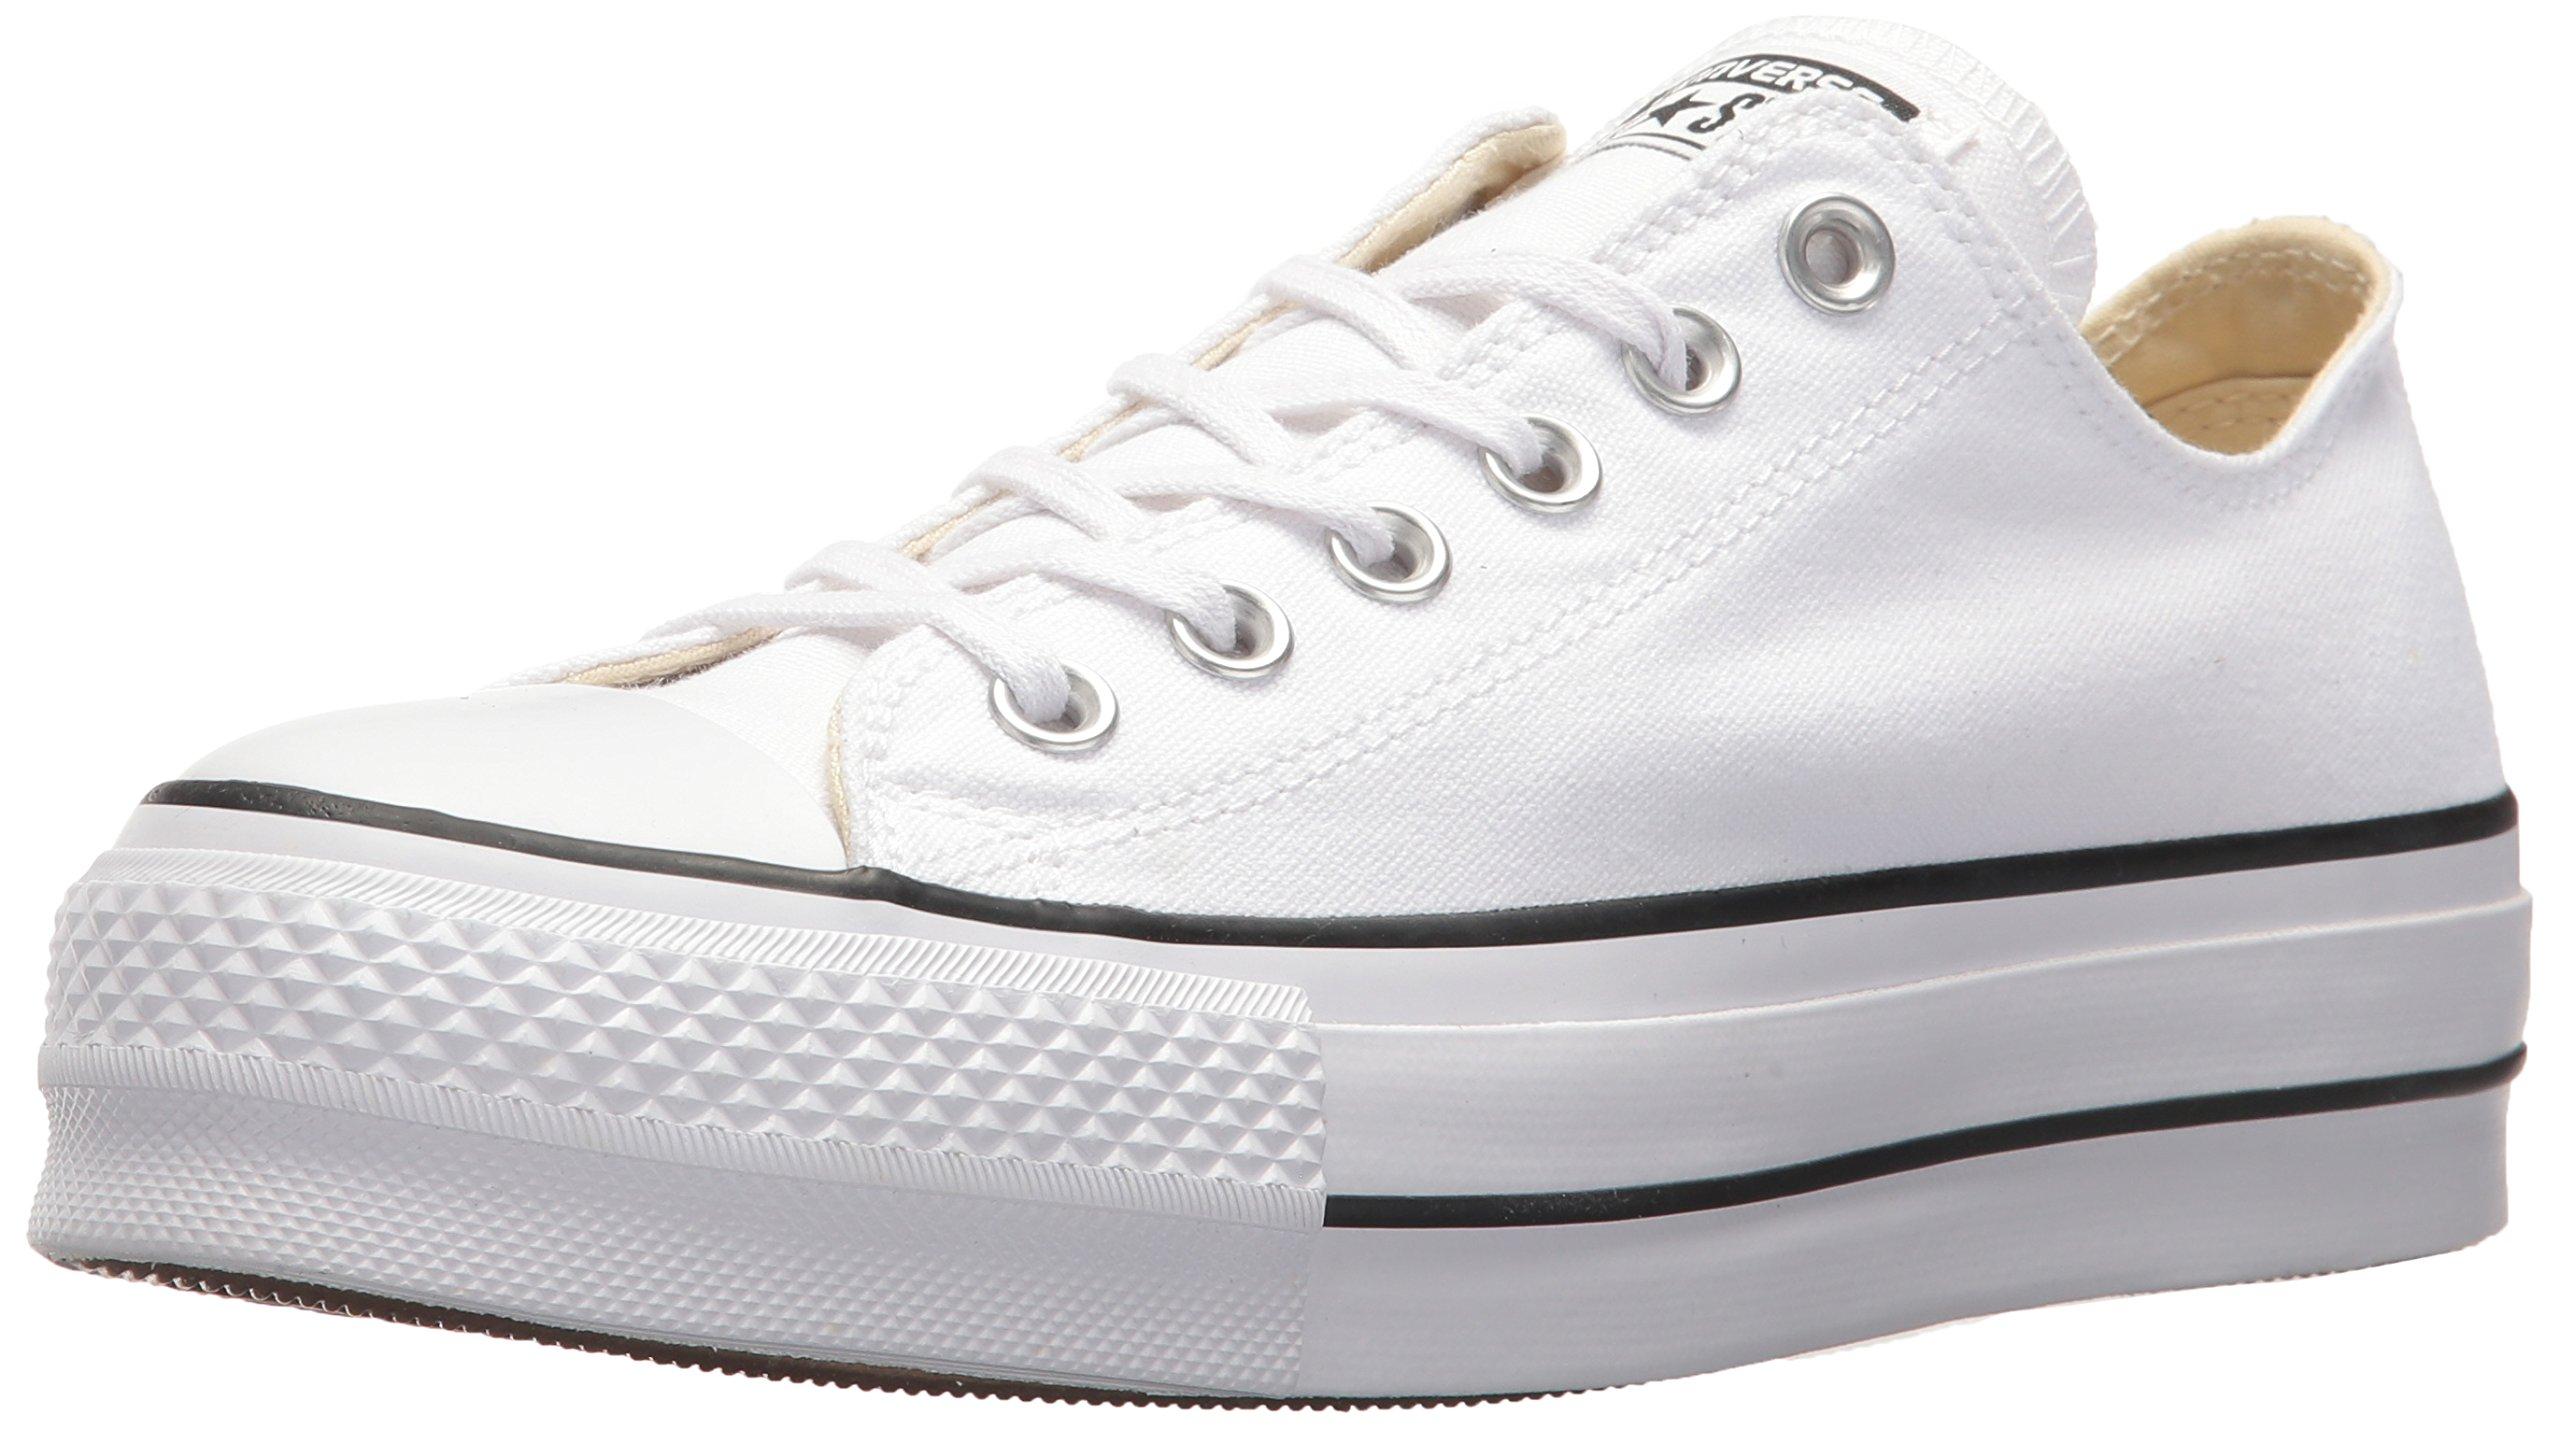 Converse Women's Lift Canvas Low Top Sneaker, Black/White, 6 M US by Converse